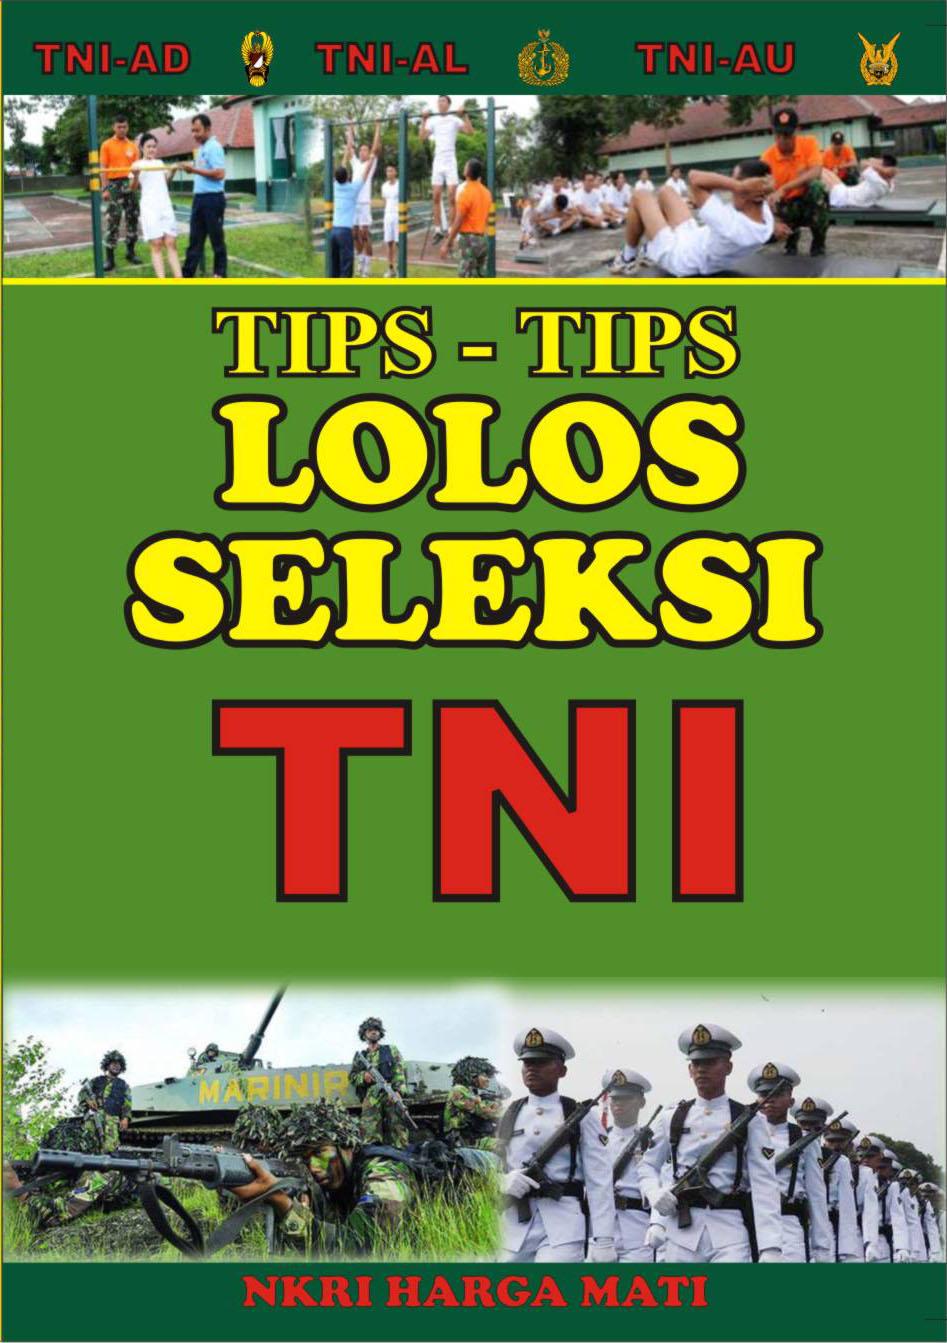 JUDUL BUKU : TIPS-TIPS LOLOS SELEKSI MASUK TNI